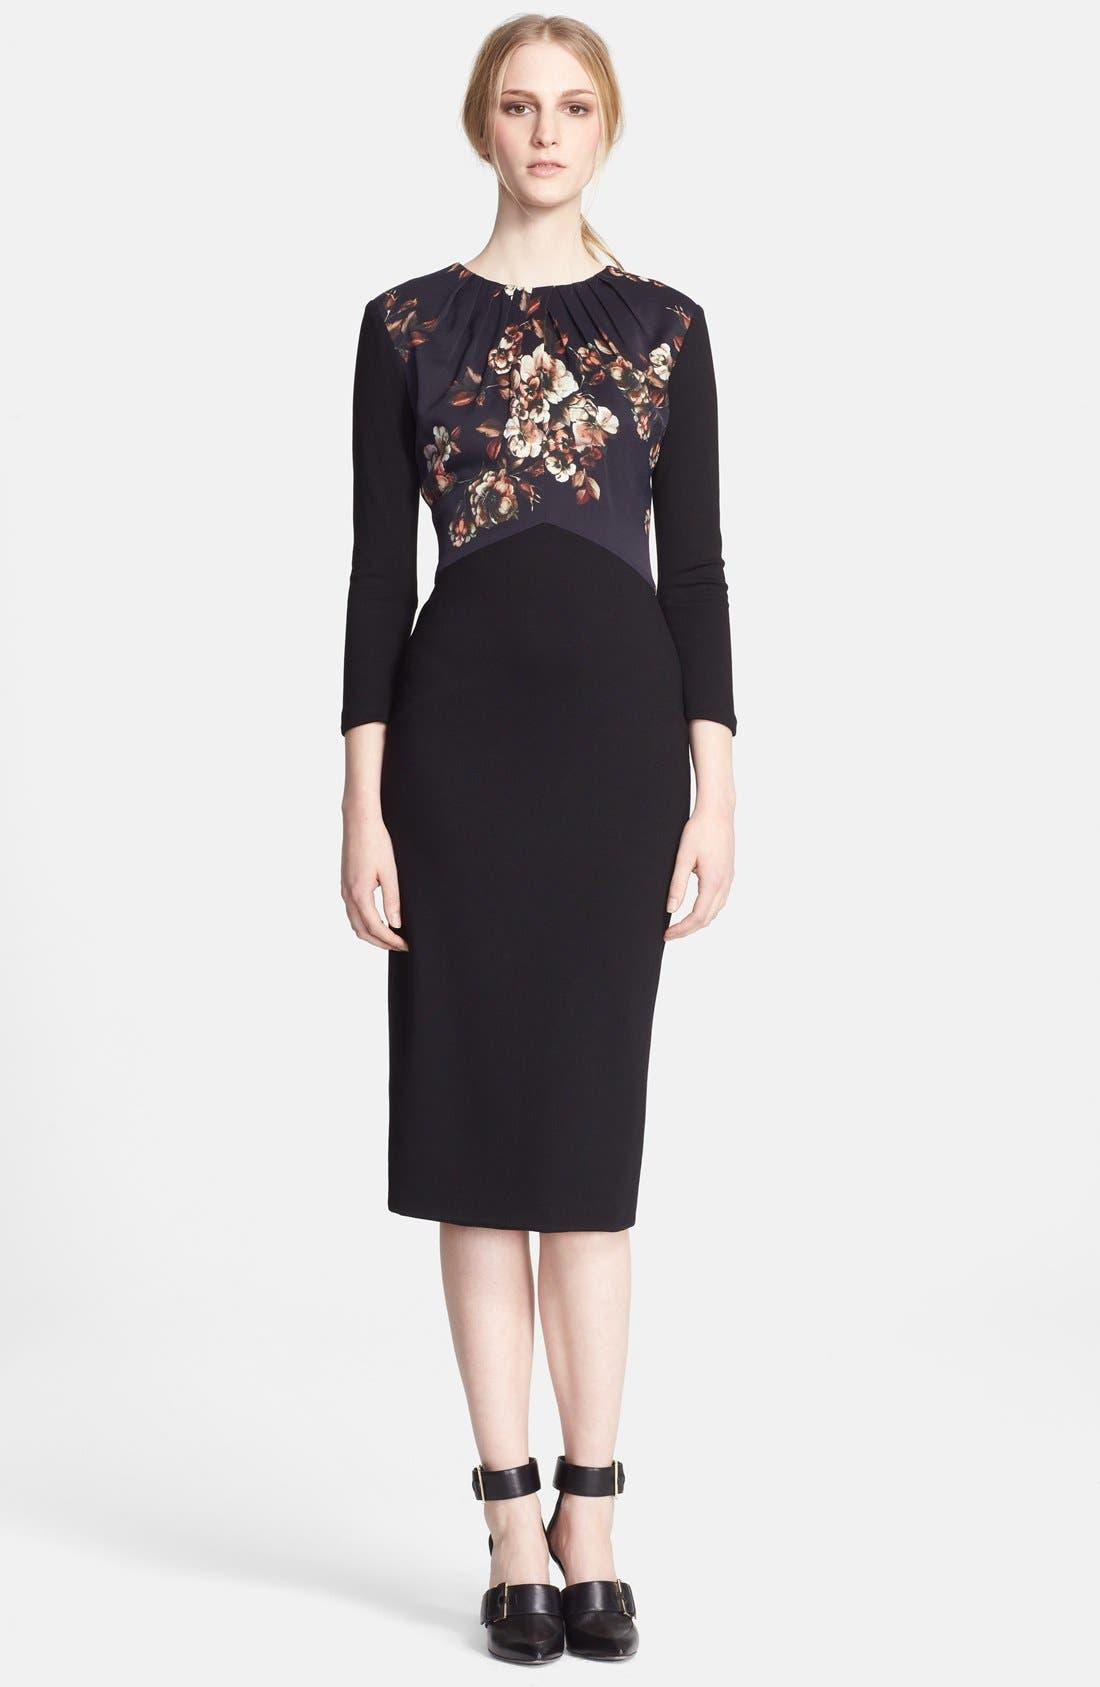 Main Image - Jason Wu Print Contrast Knit Midi Dress